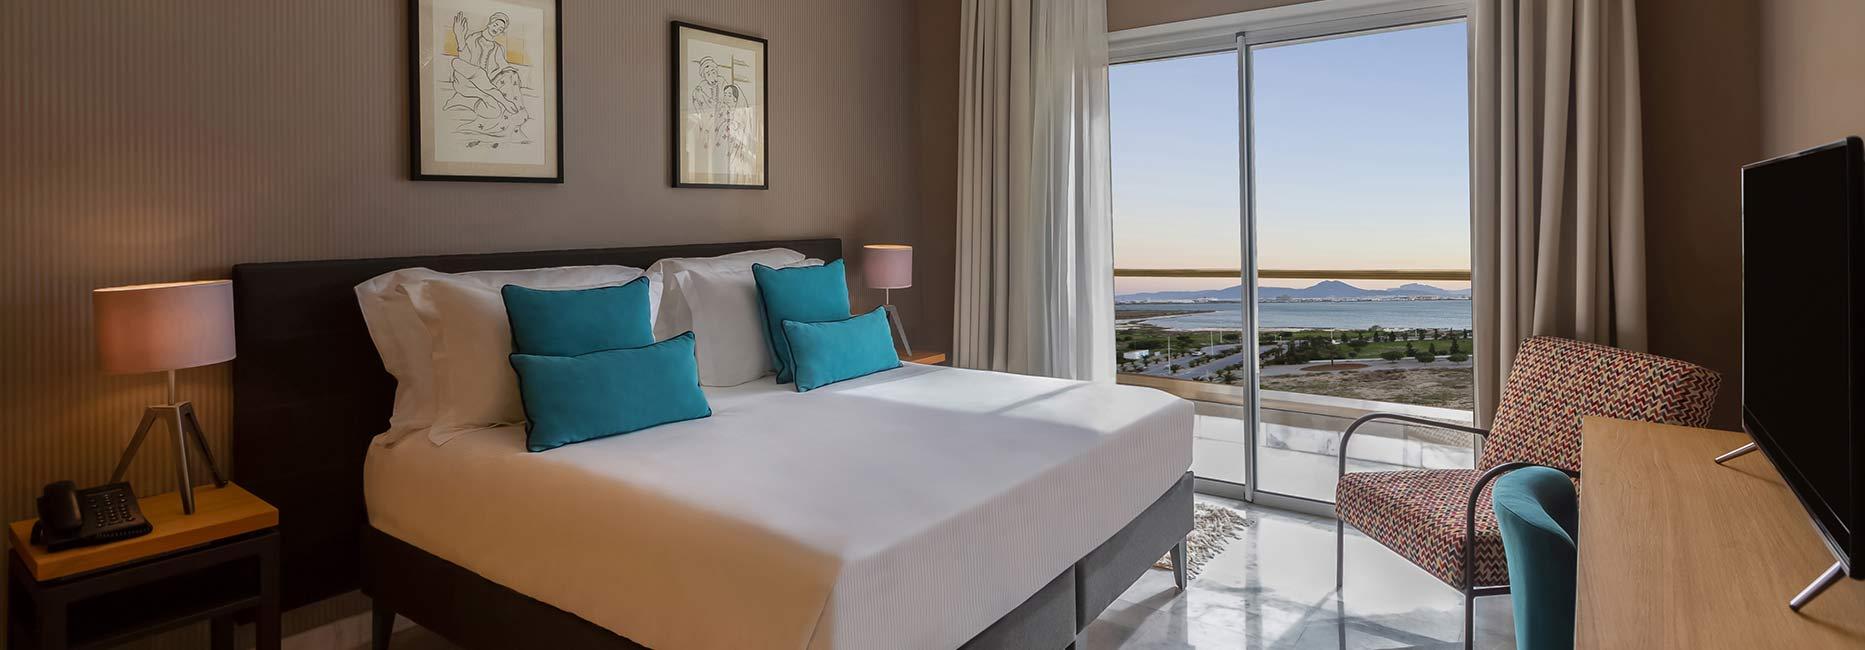 Avani One Bedroom Suite Bedroom at Avani Les Berges du Lac Tunis Suites